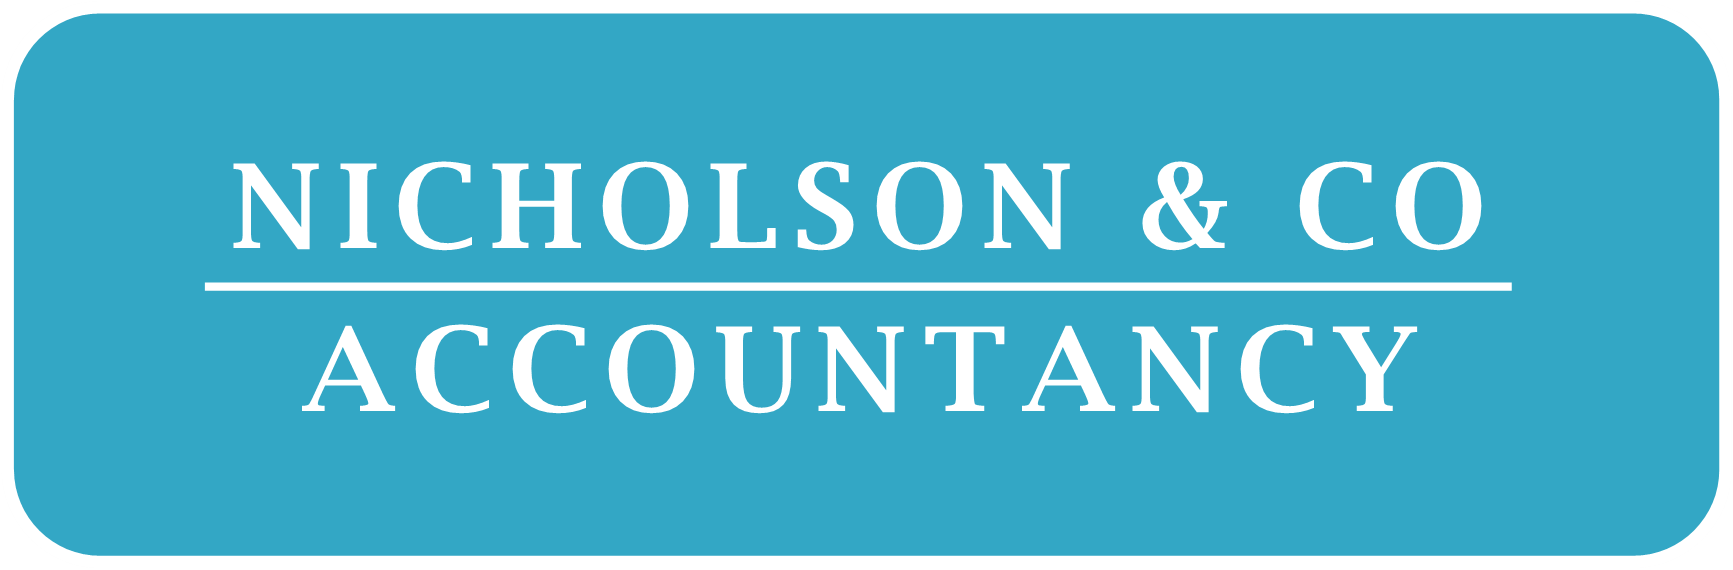 Nicholson & Co Accountancy